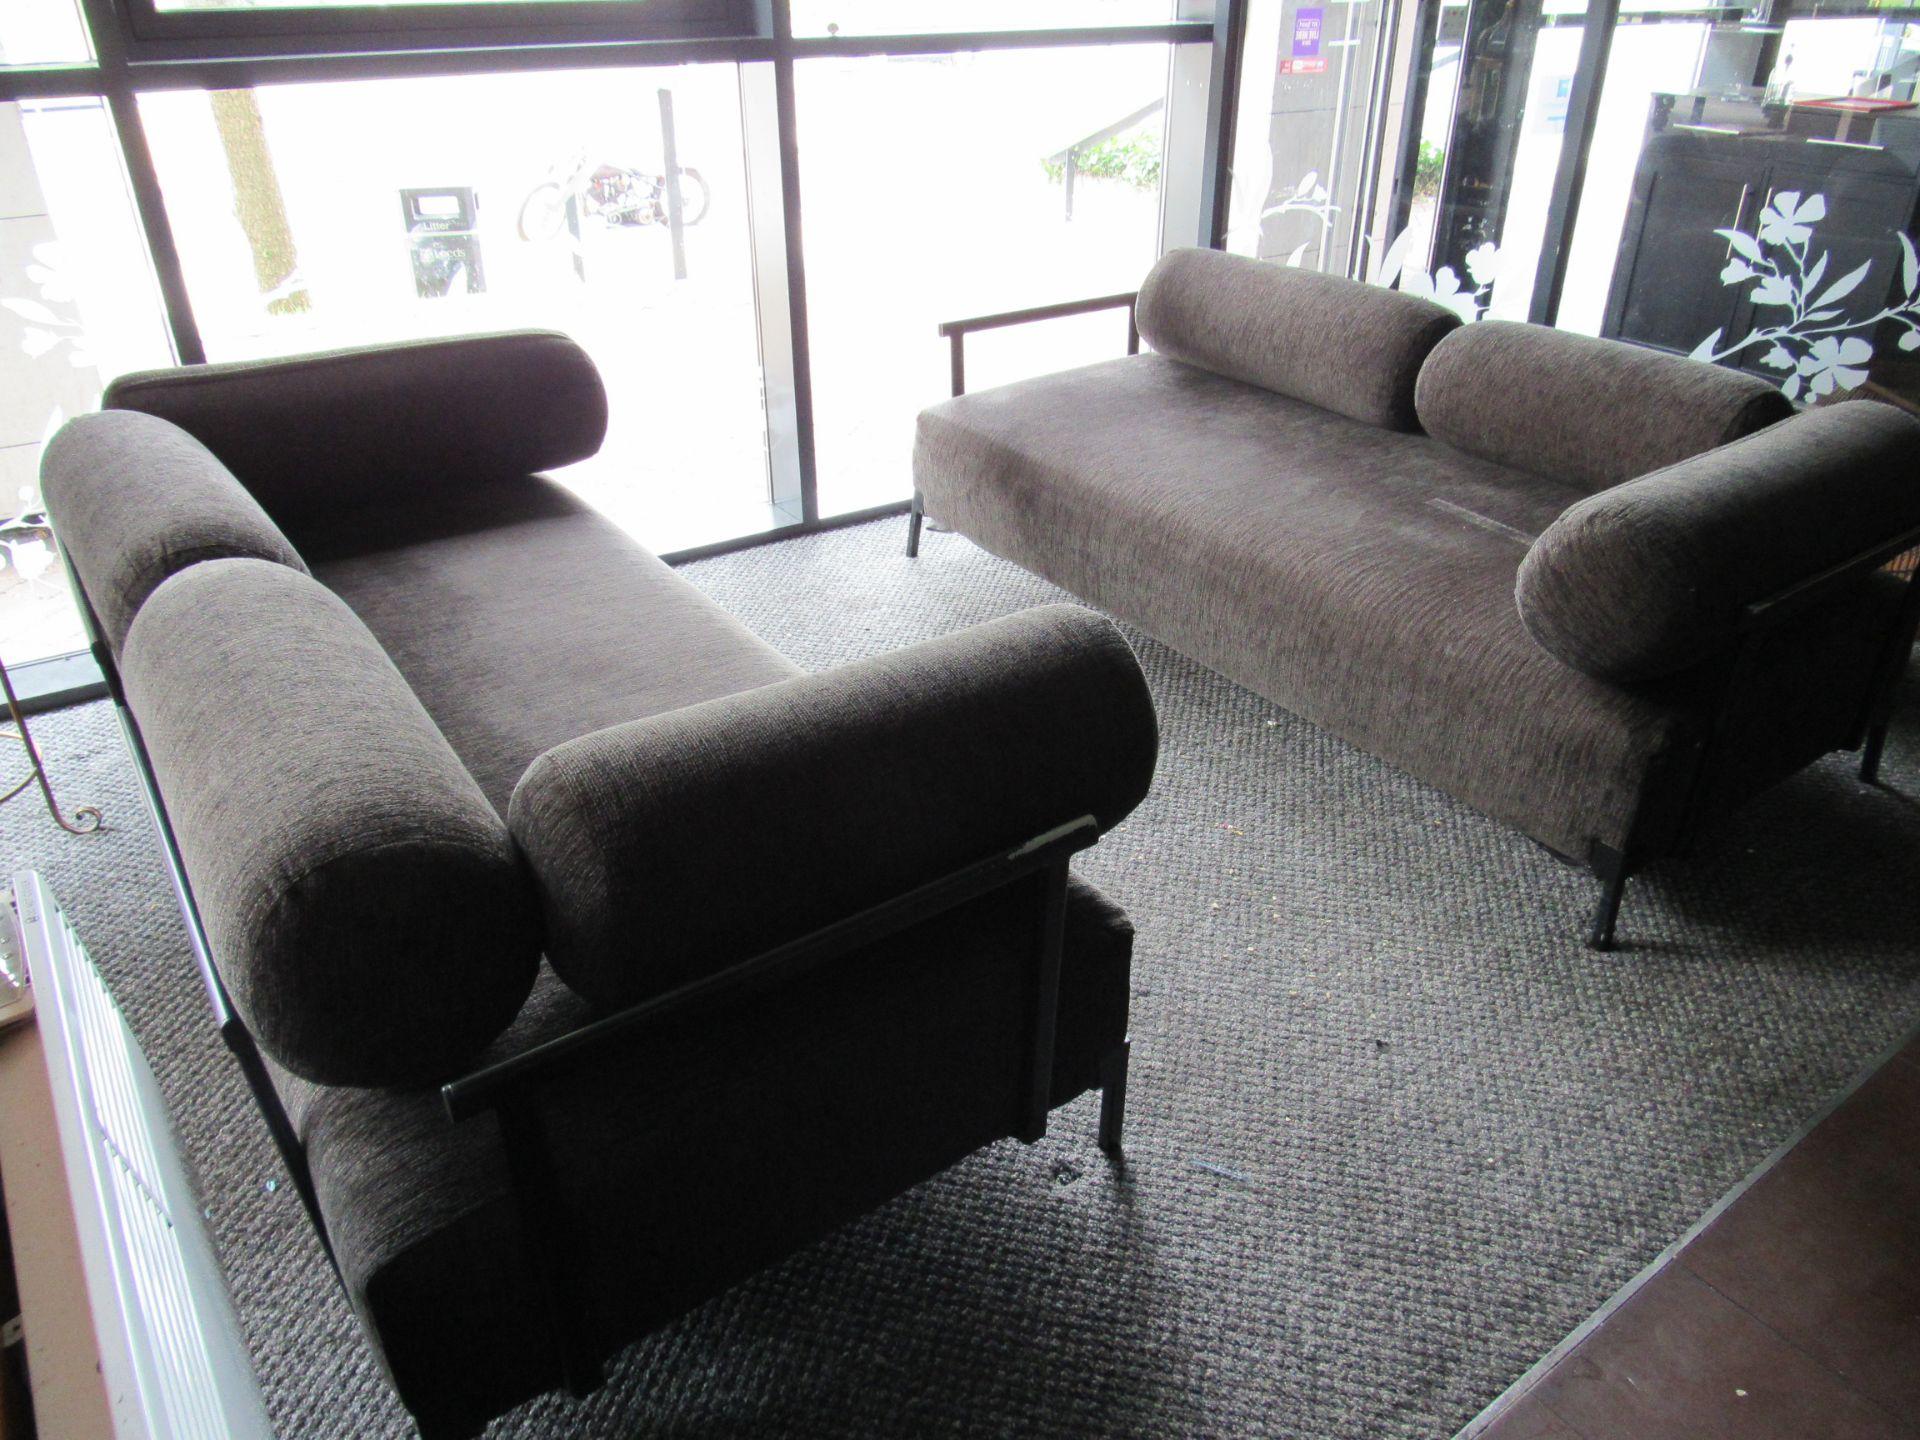 2 Steel Framed Upholstered Sofas - Image 2 of 4